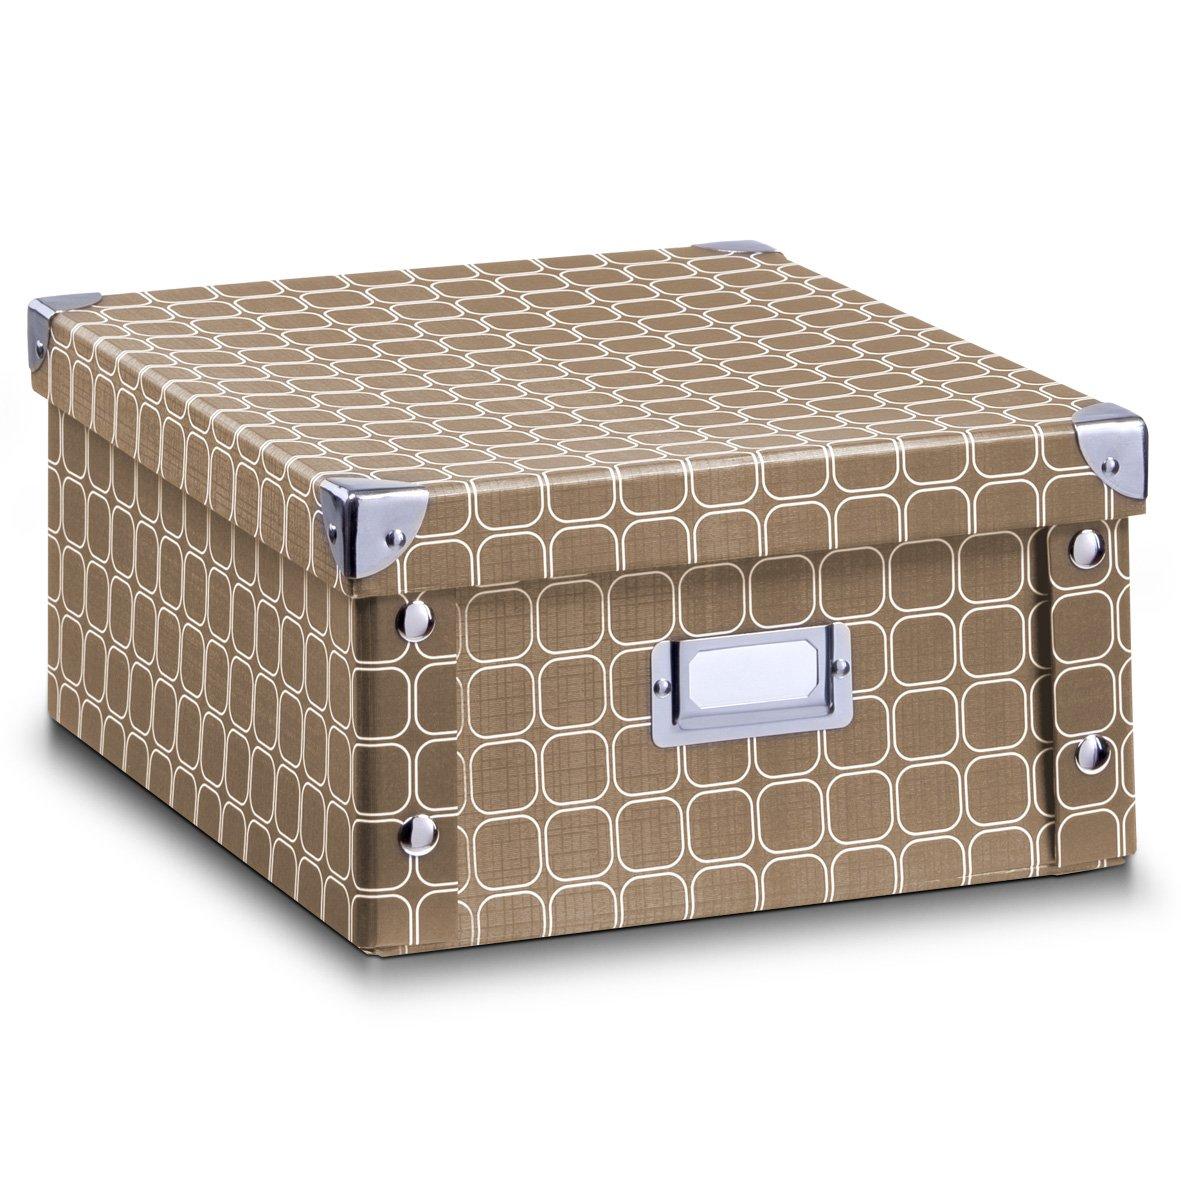 Zeller 17595 Caja de almacenaje de cartón Gris (Grau) 16.5 x 28 x 15 cm: Amazon.es: Hogar